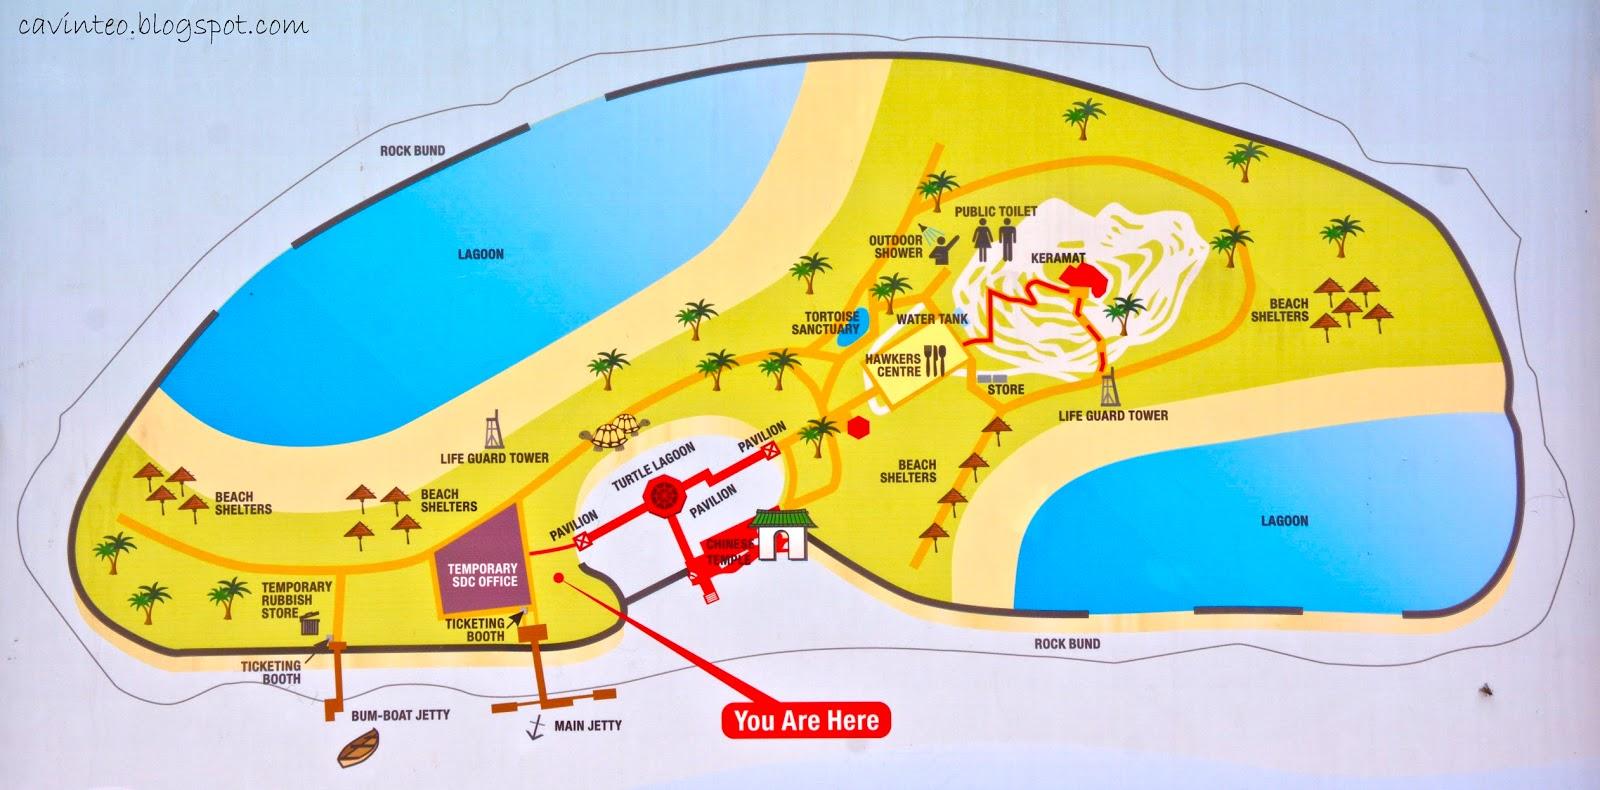 Entree Kibbles Kusu Island 2016 An Annual Pilgrimage